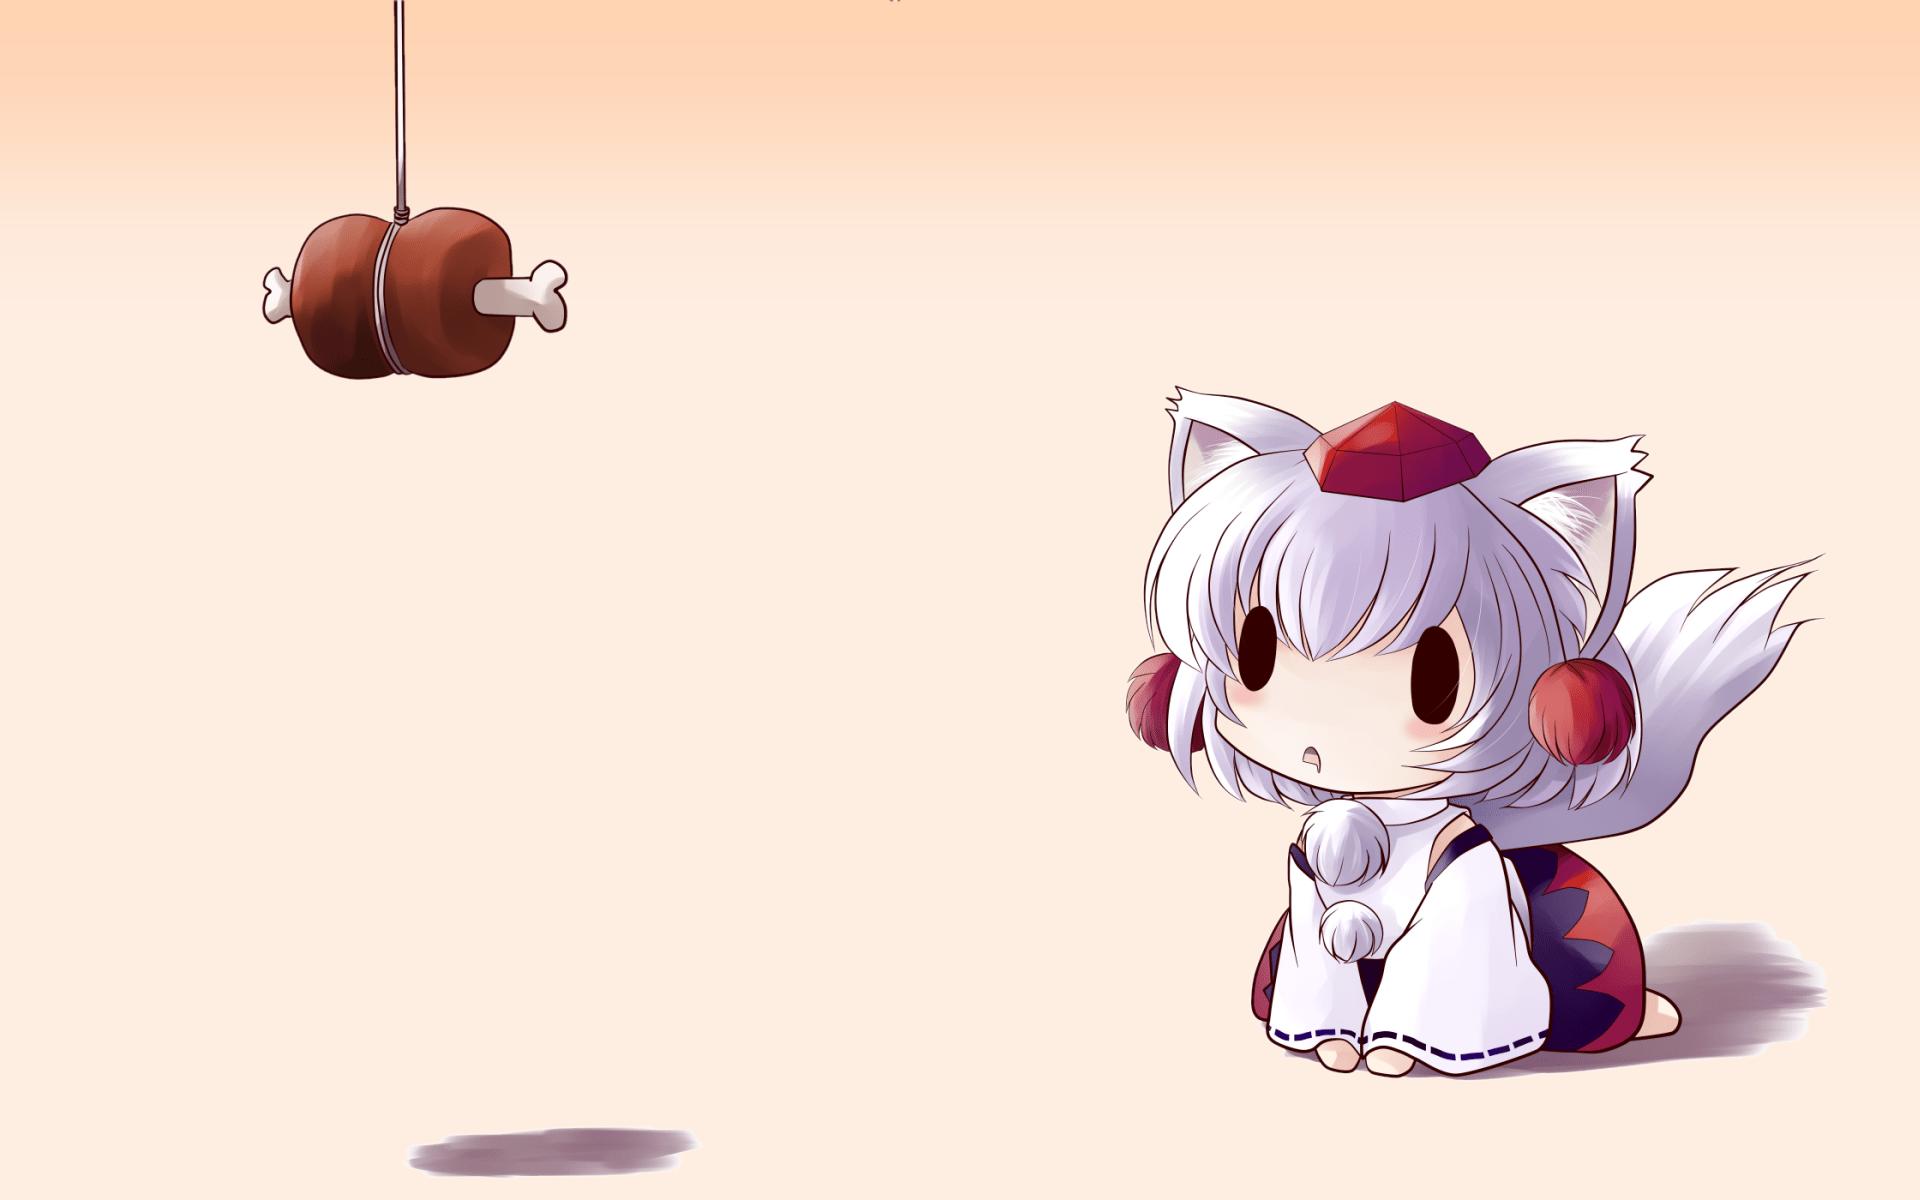 Animal Crossing Fall Wallpaper Fan Art Of Inubashiri Momiji From The Game Touhou Image